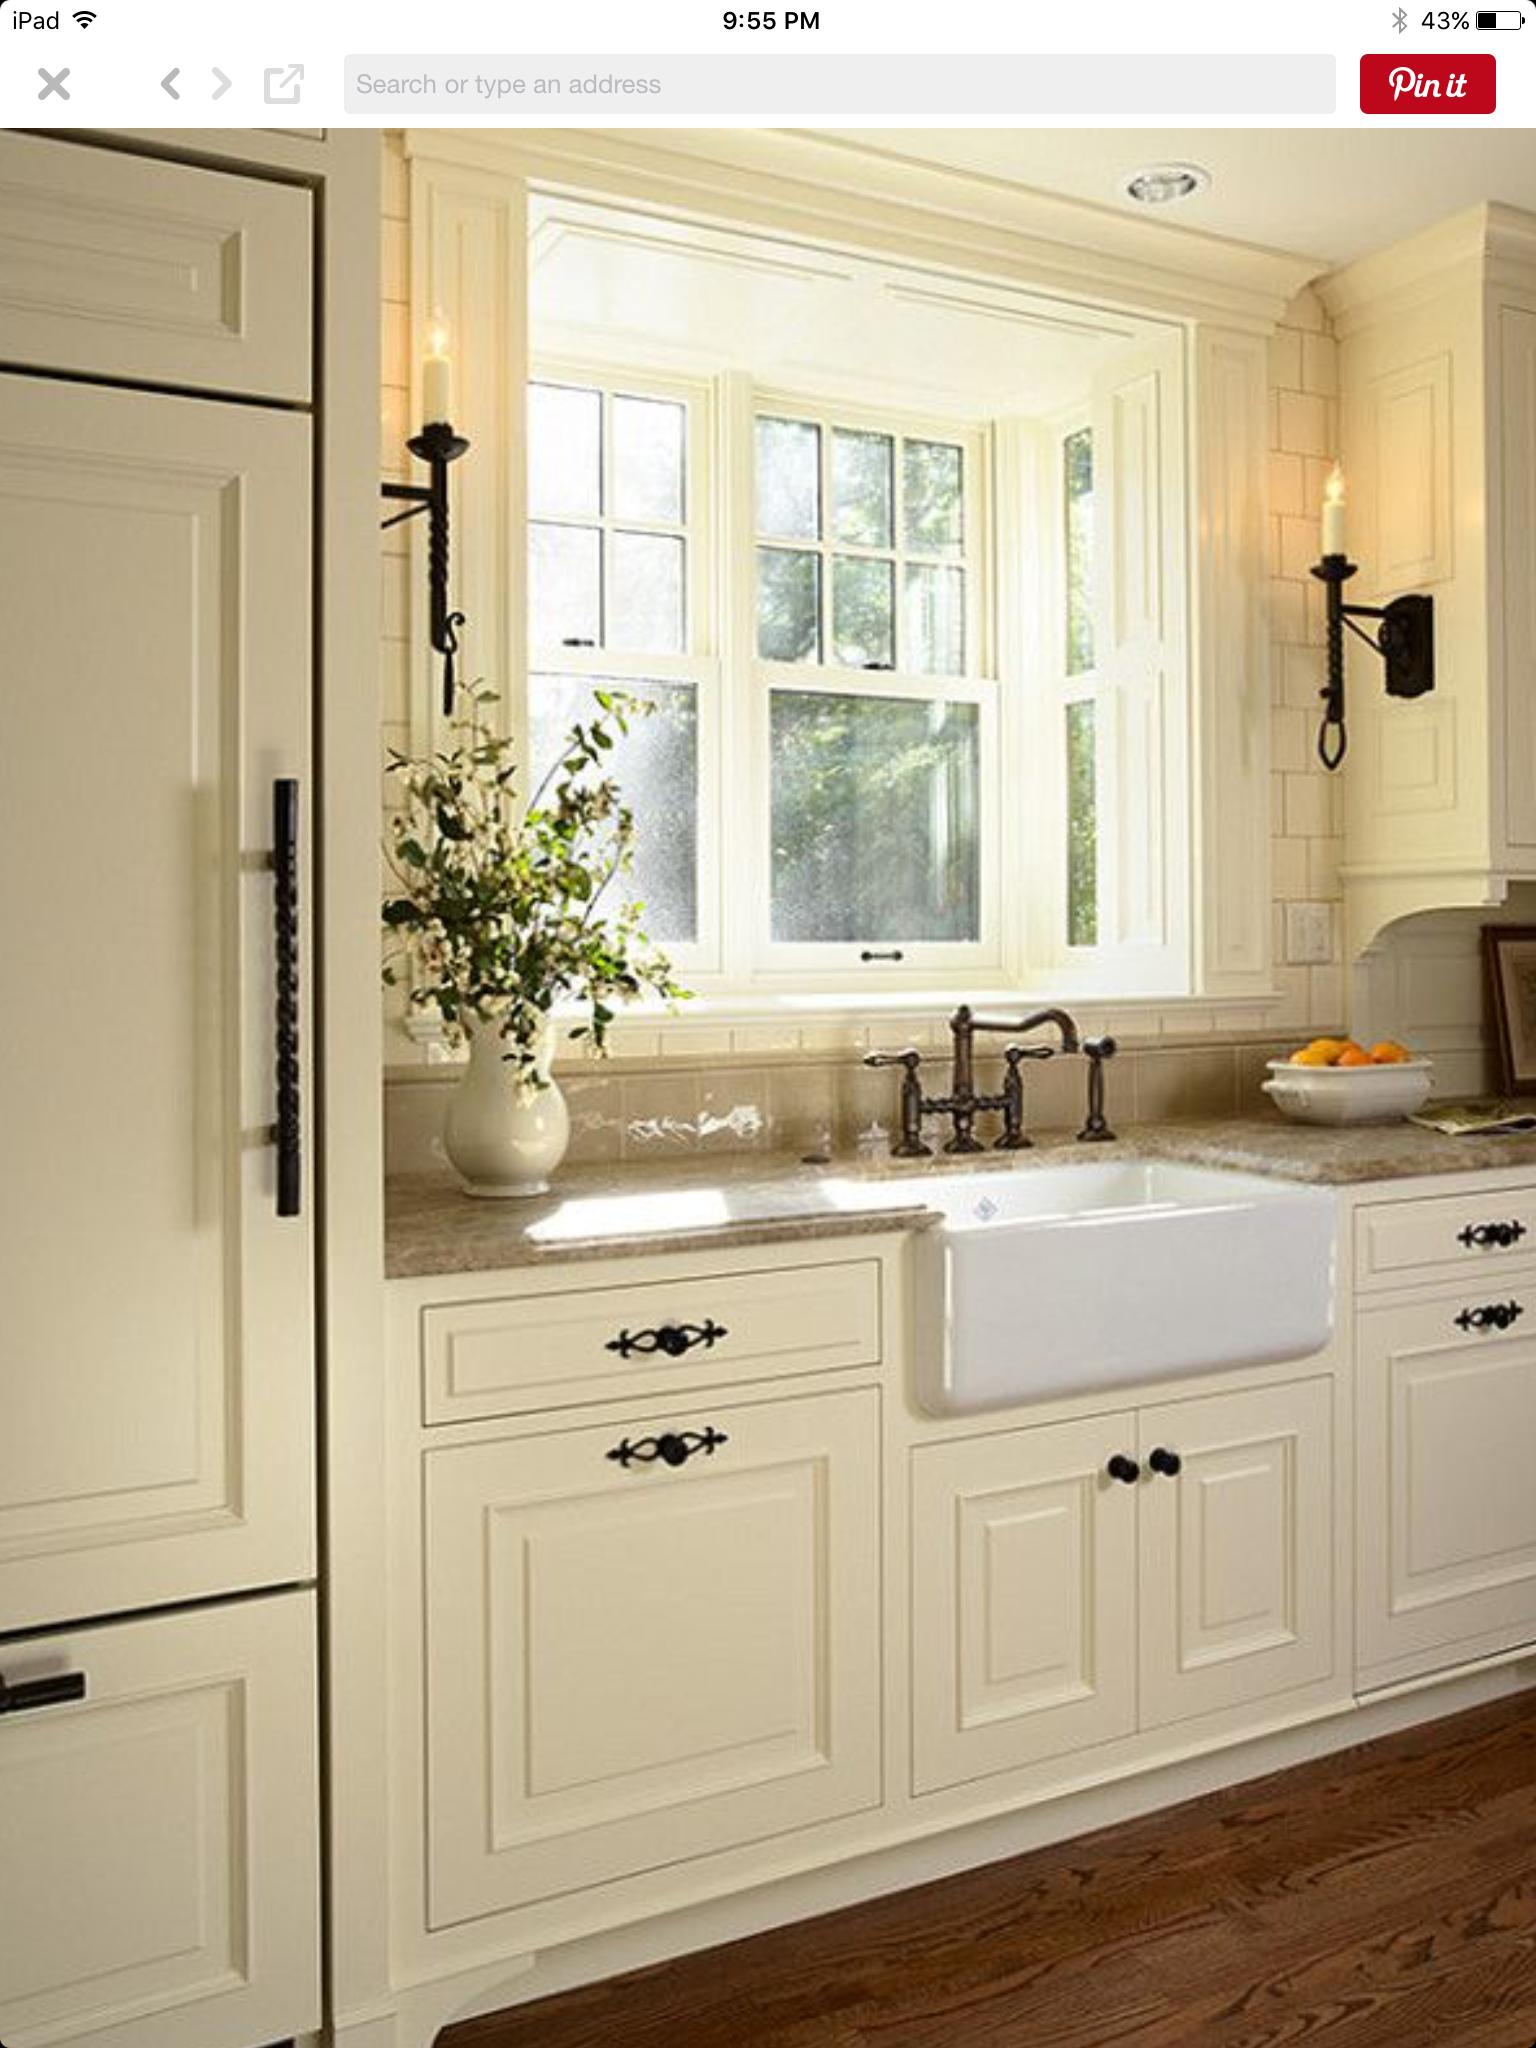 Definitivamente Aqui Aproveitar A Ideia Como Esta As Pegas Dos Armarios De C Rustic Farmhouse Kitchen Farmhouse Kitchen Cabinets Kitchen Cabinet Design